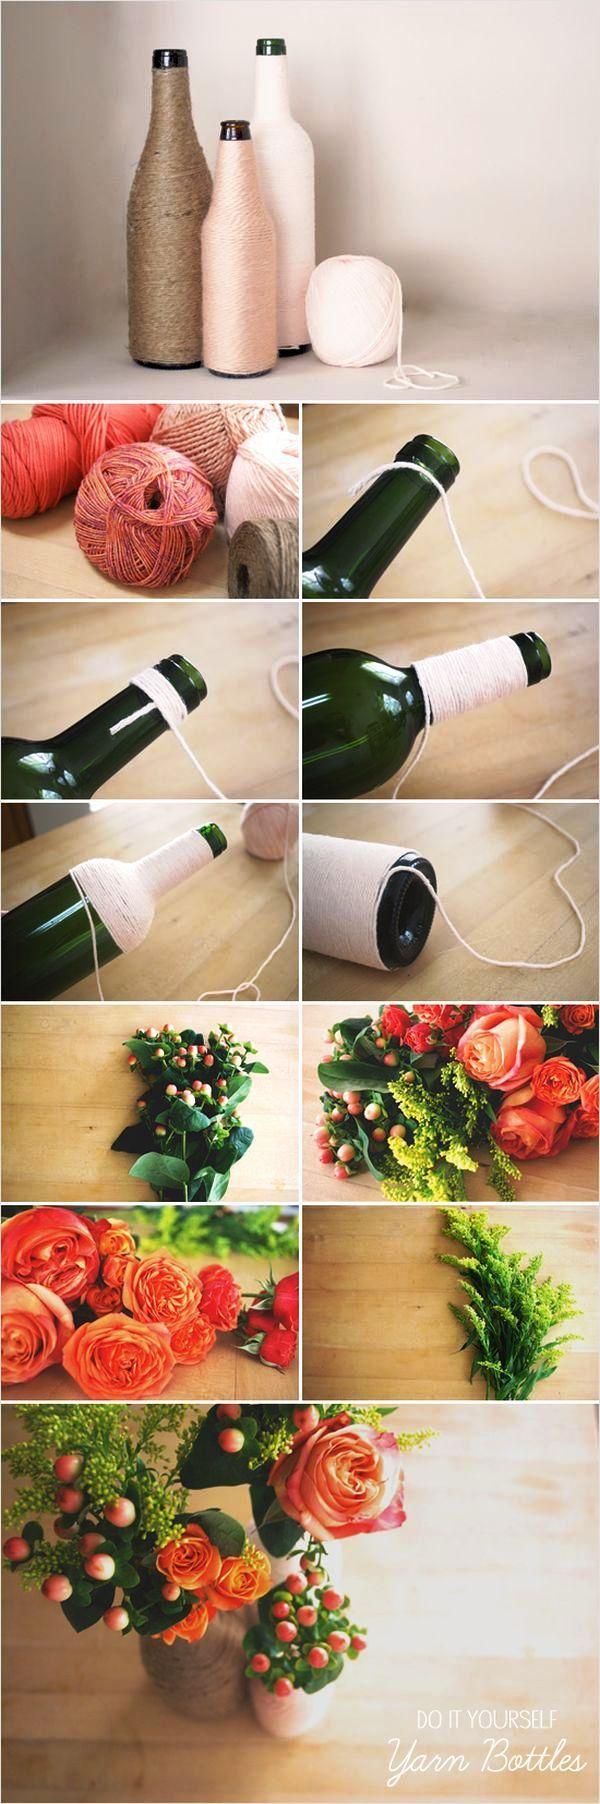 Creative DIY Flower Arrangements DIY Yarn Bottles and Flower Arrangements